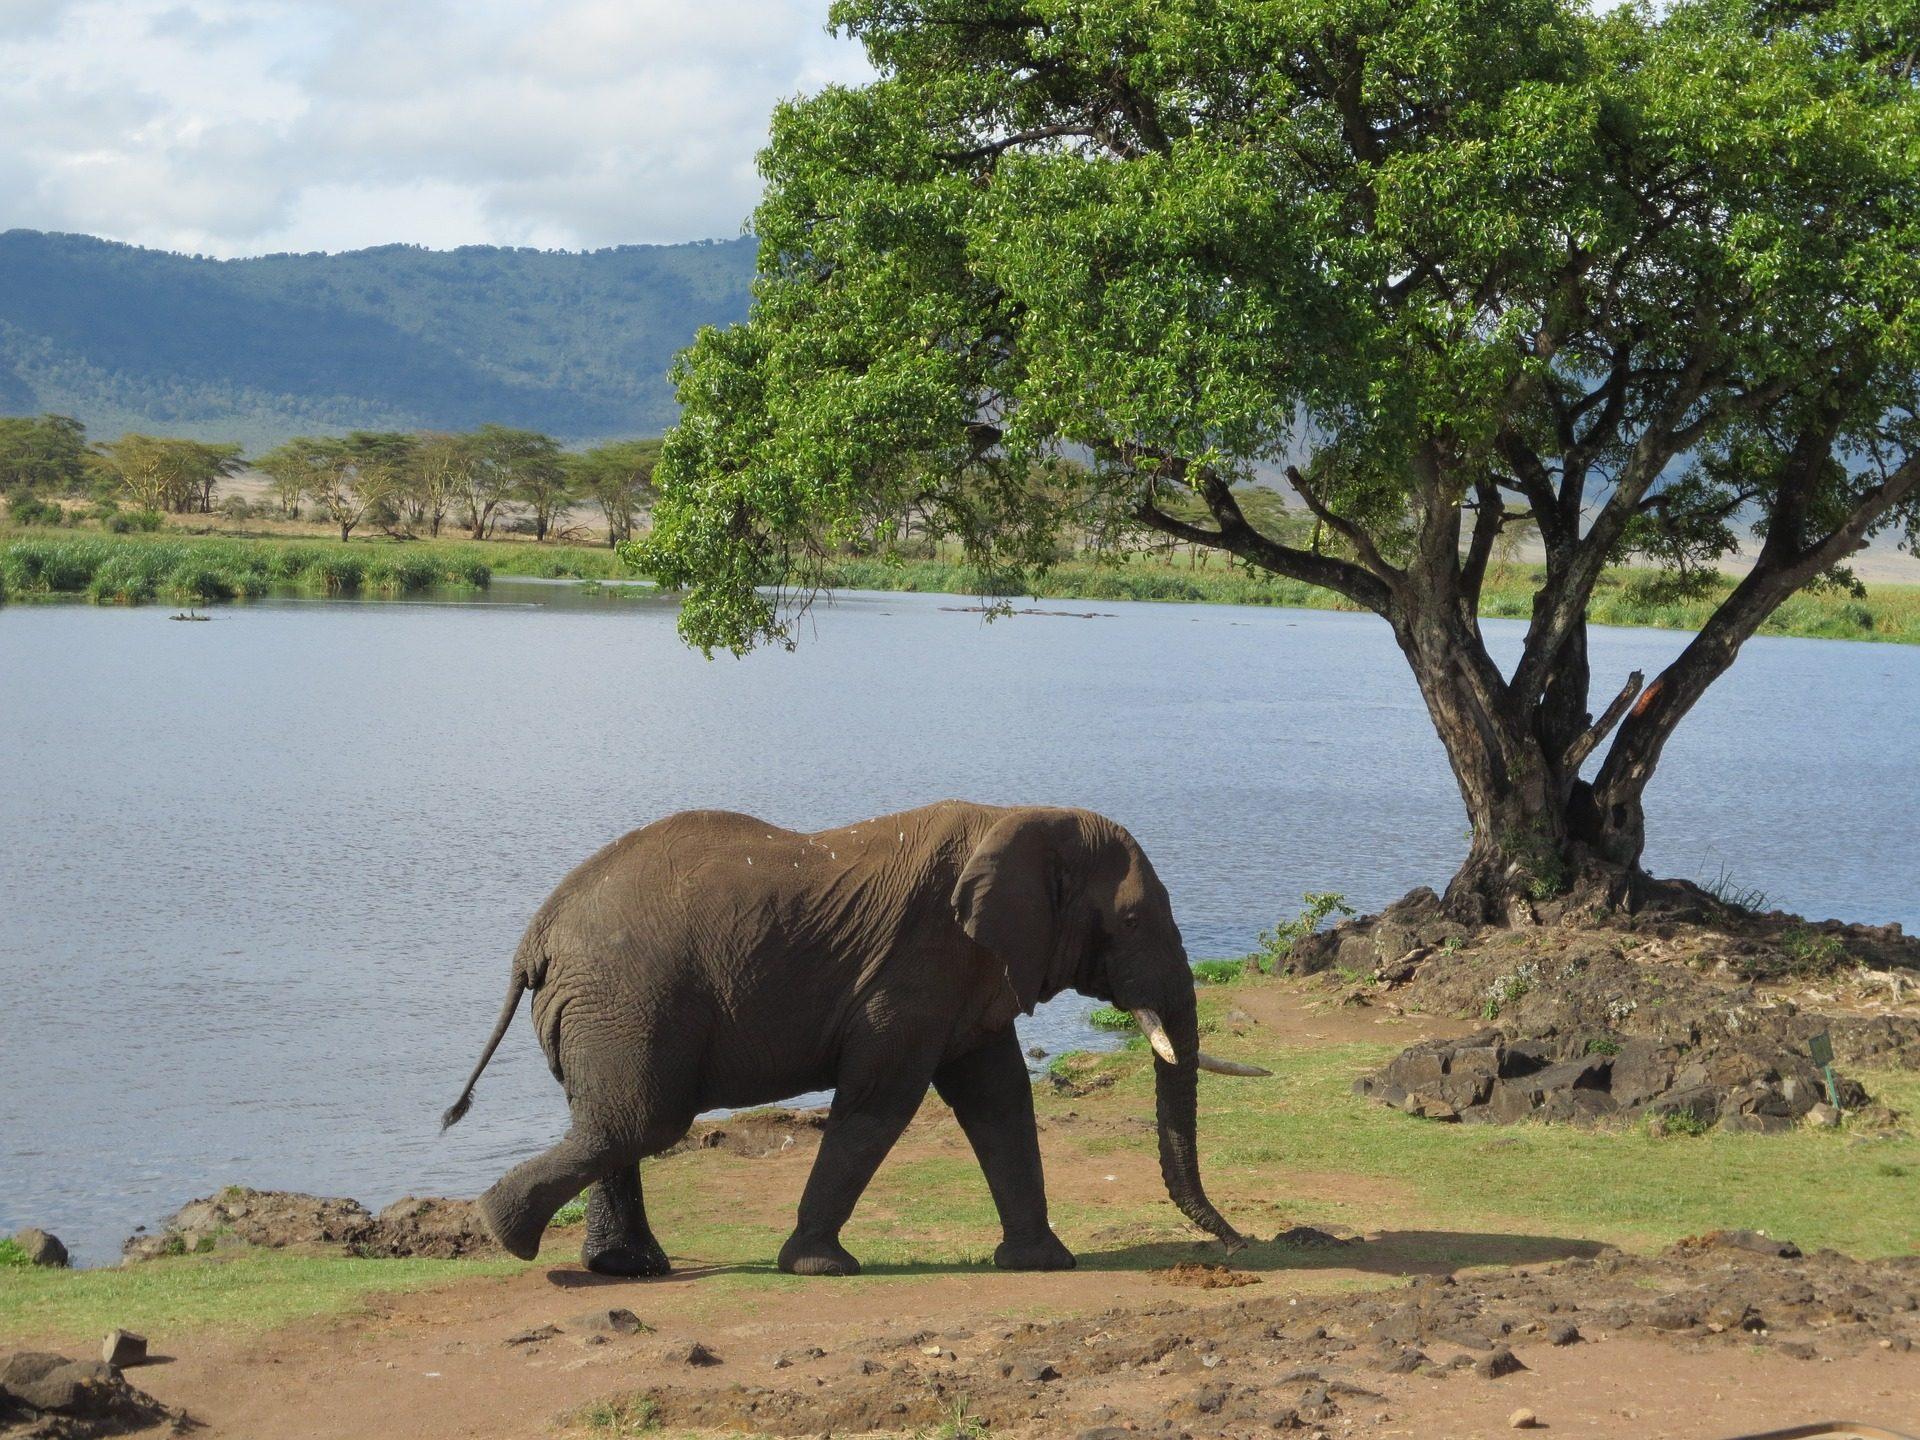 Elefant, Wild, Lake, Fluss, Baum - Wallpaper HD - Prof.-falken.com